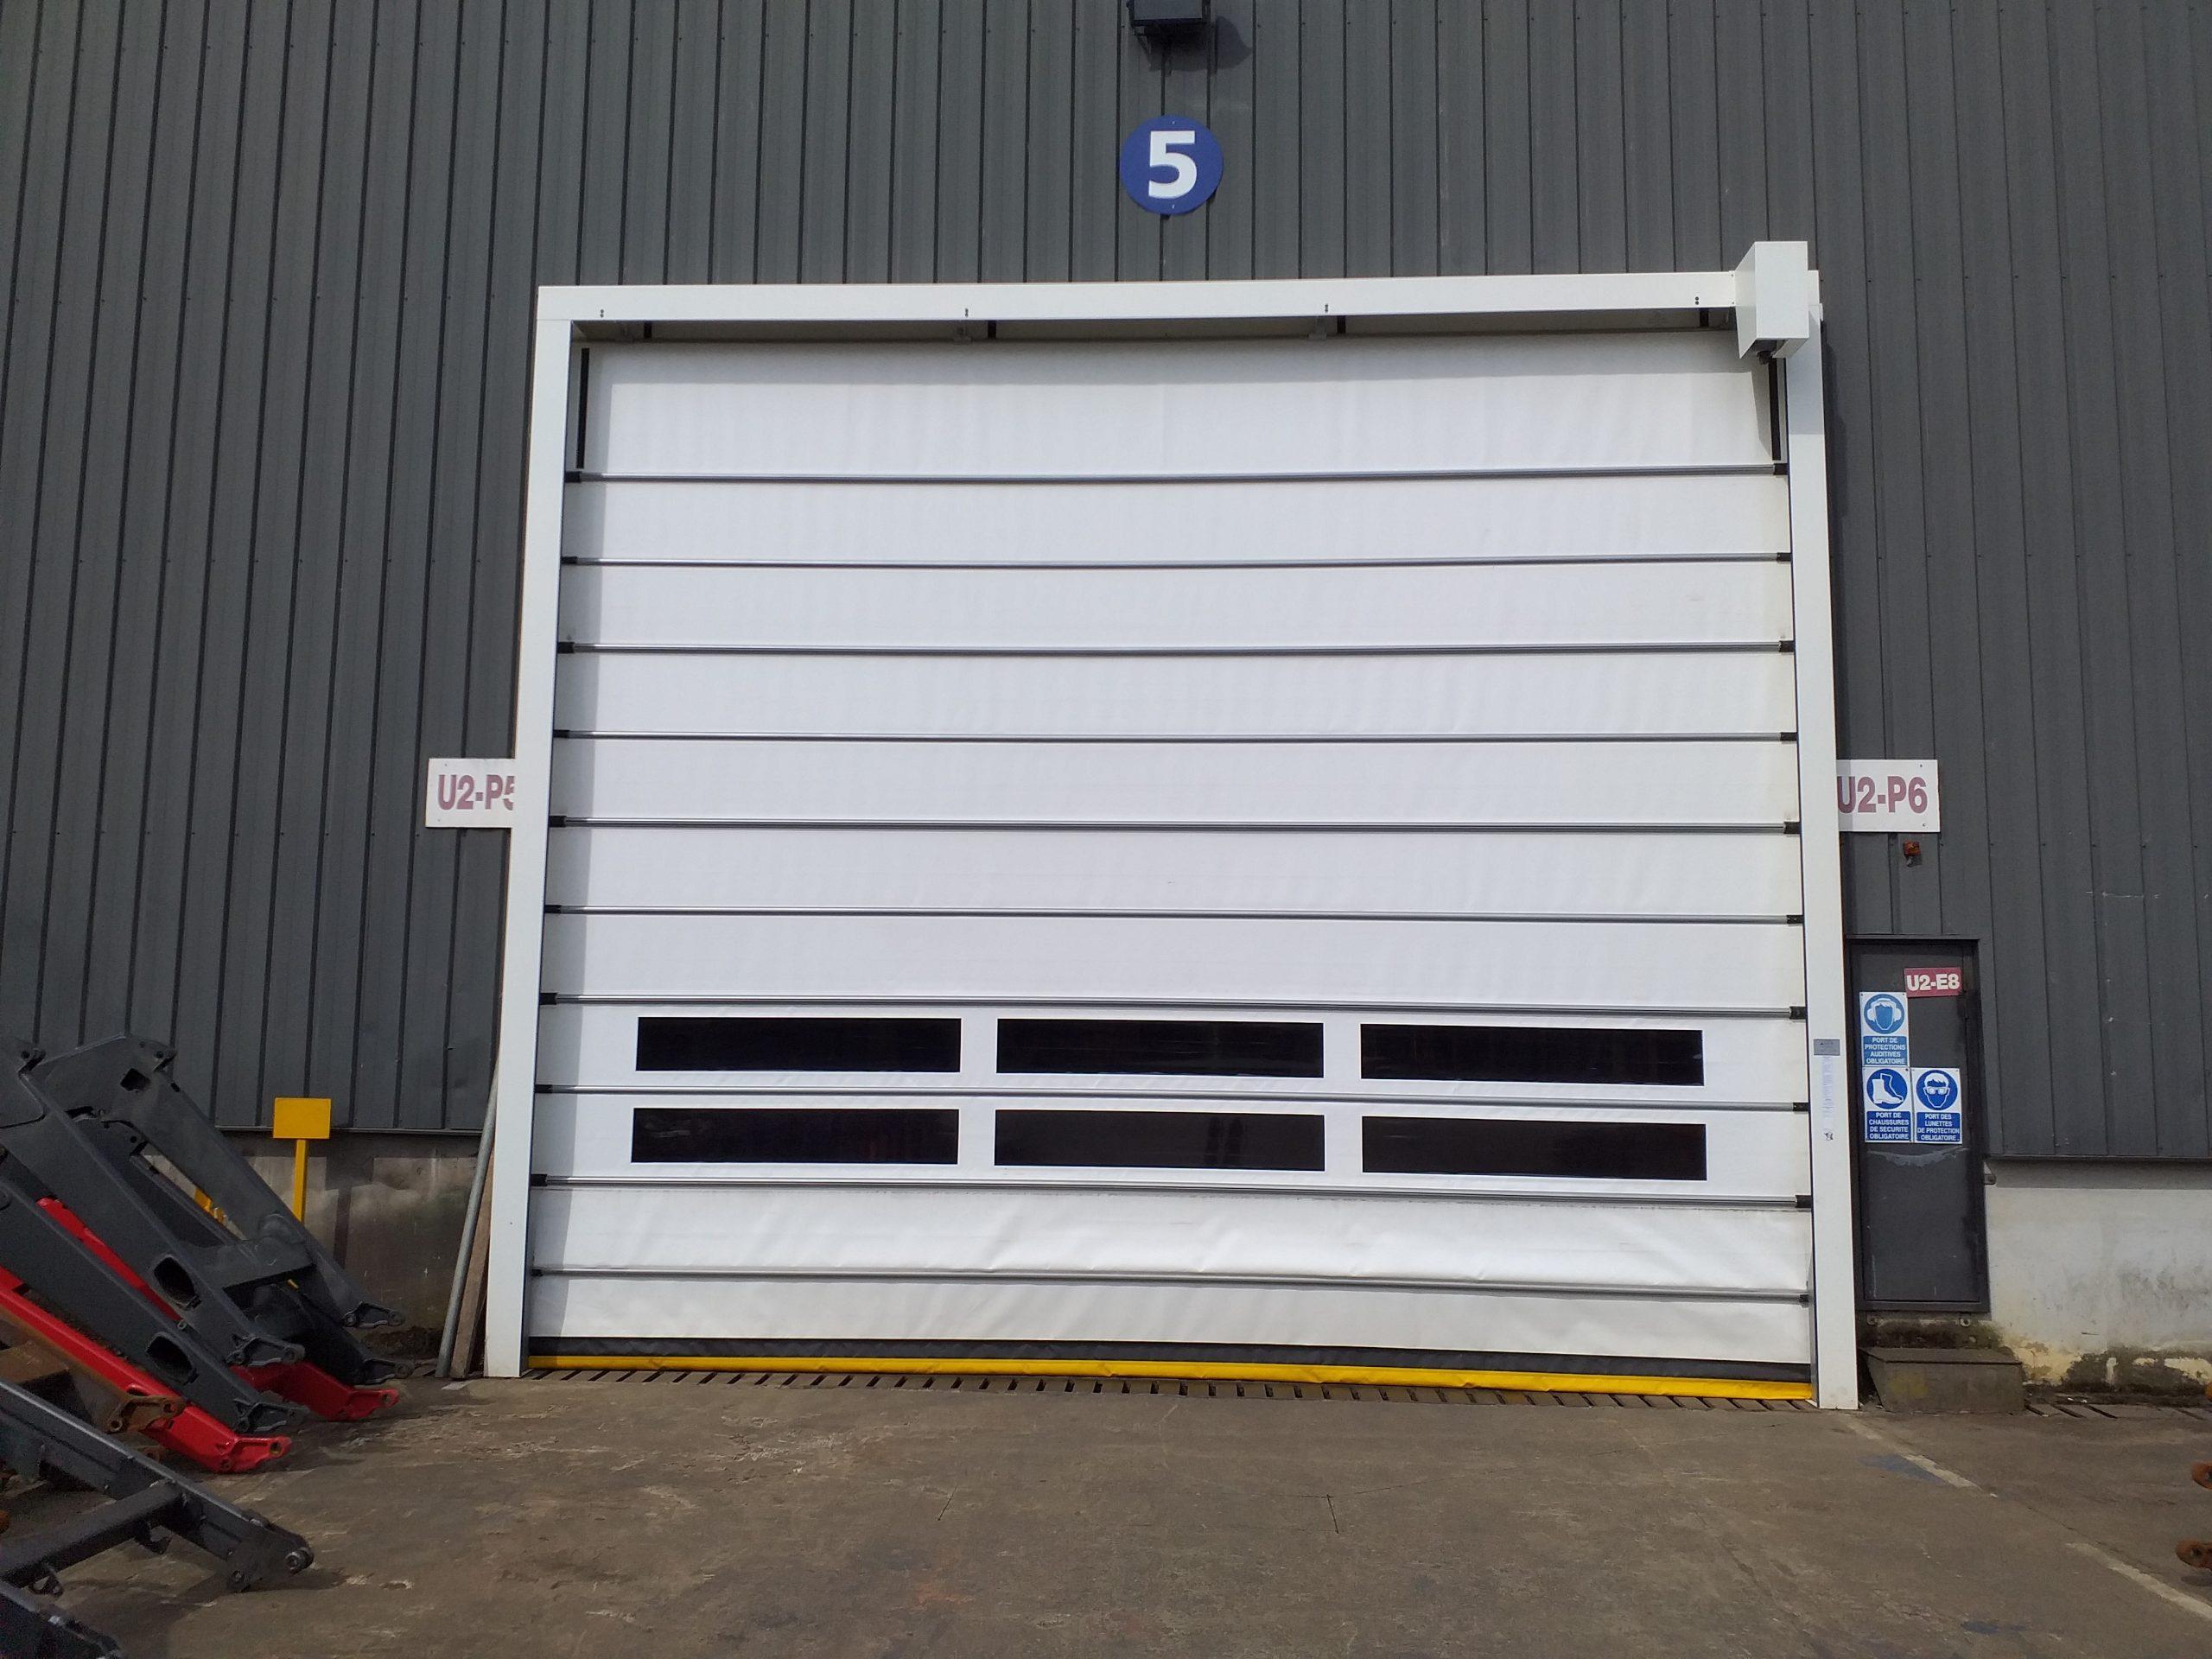 [ACIGNE] Installation d'une porte rapide SAFIR Planevite